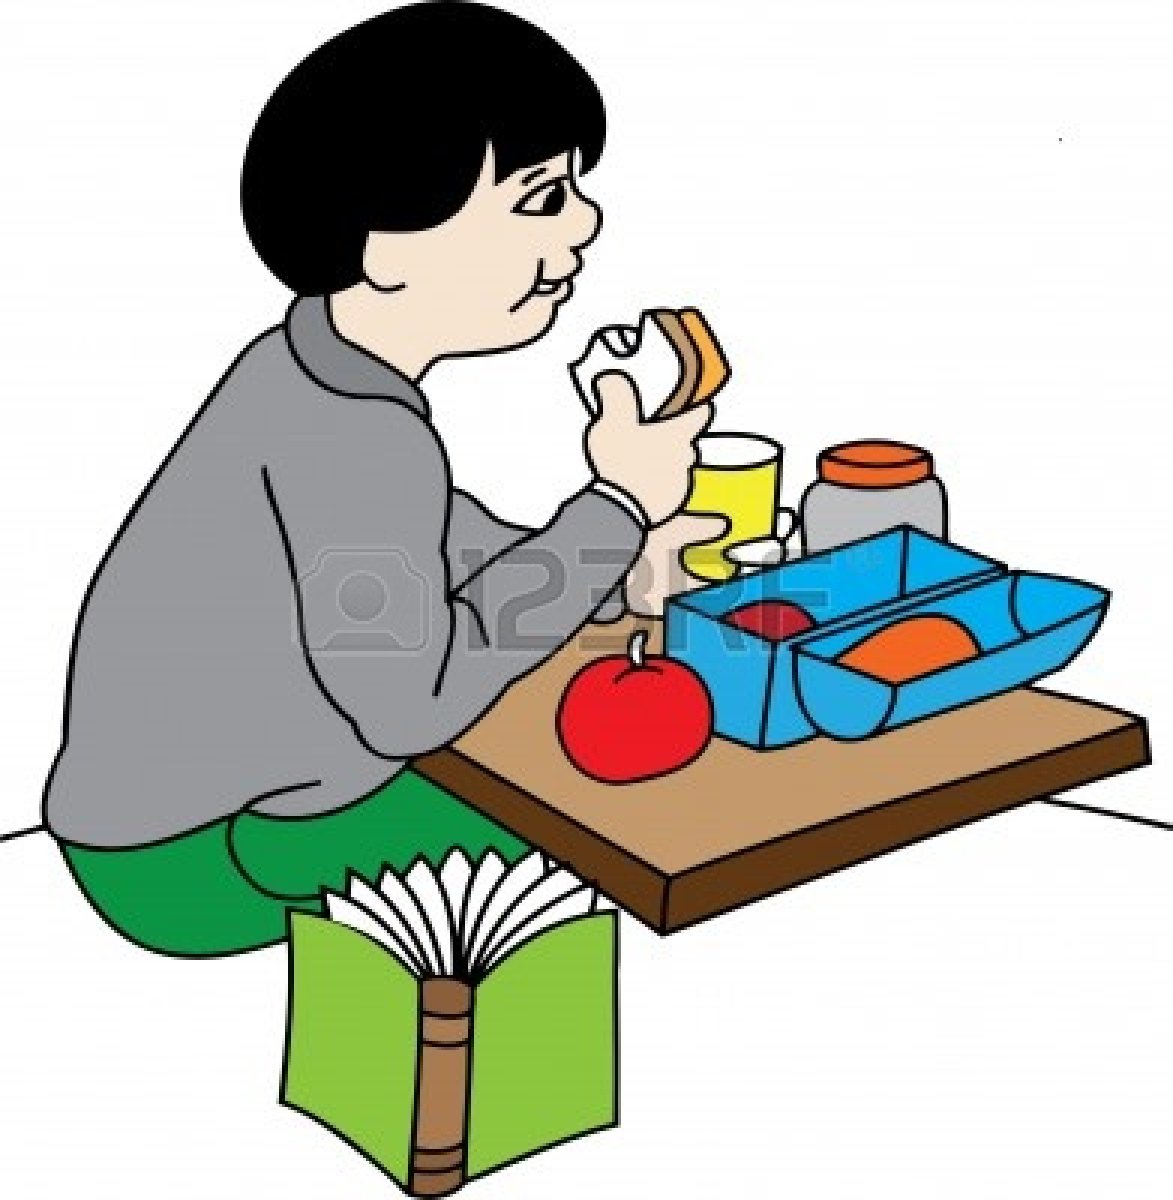 lunch break clipart clipart suggest Dinner Clip Art Sitting at Lunch Clip Art